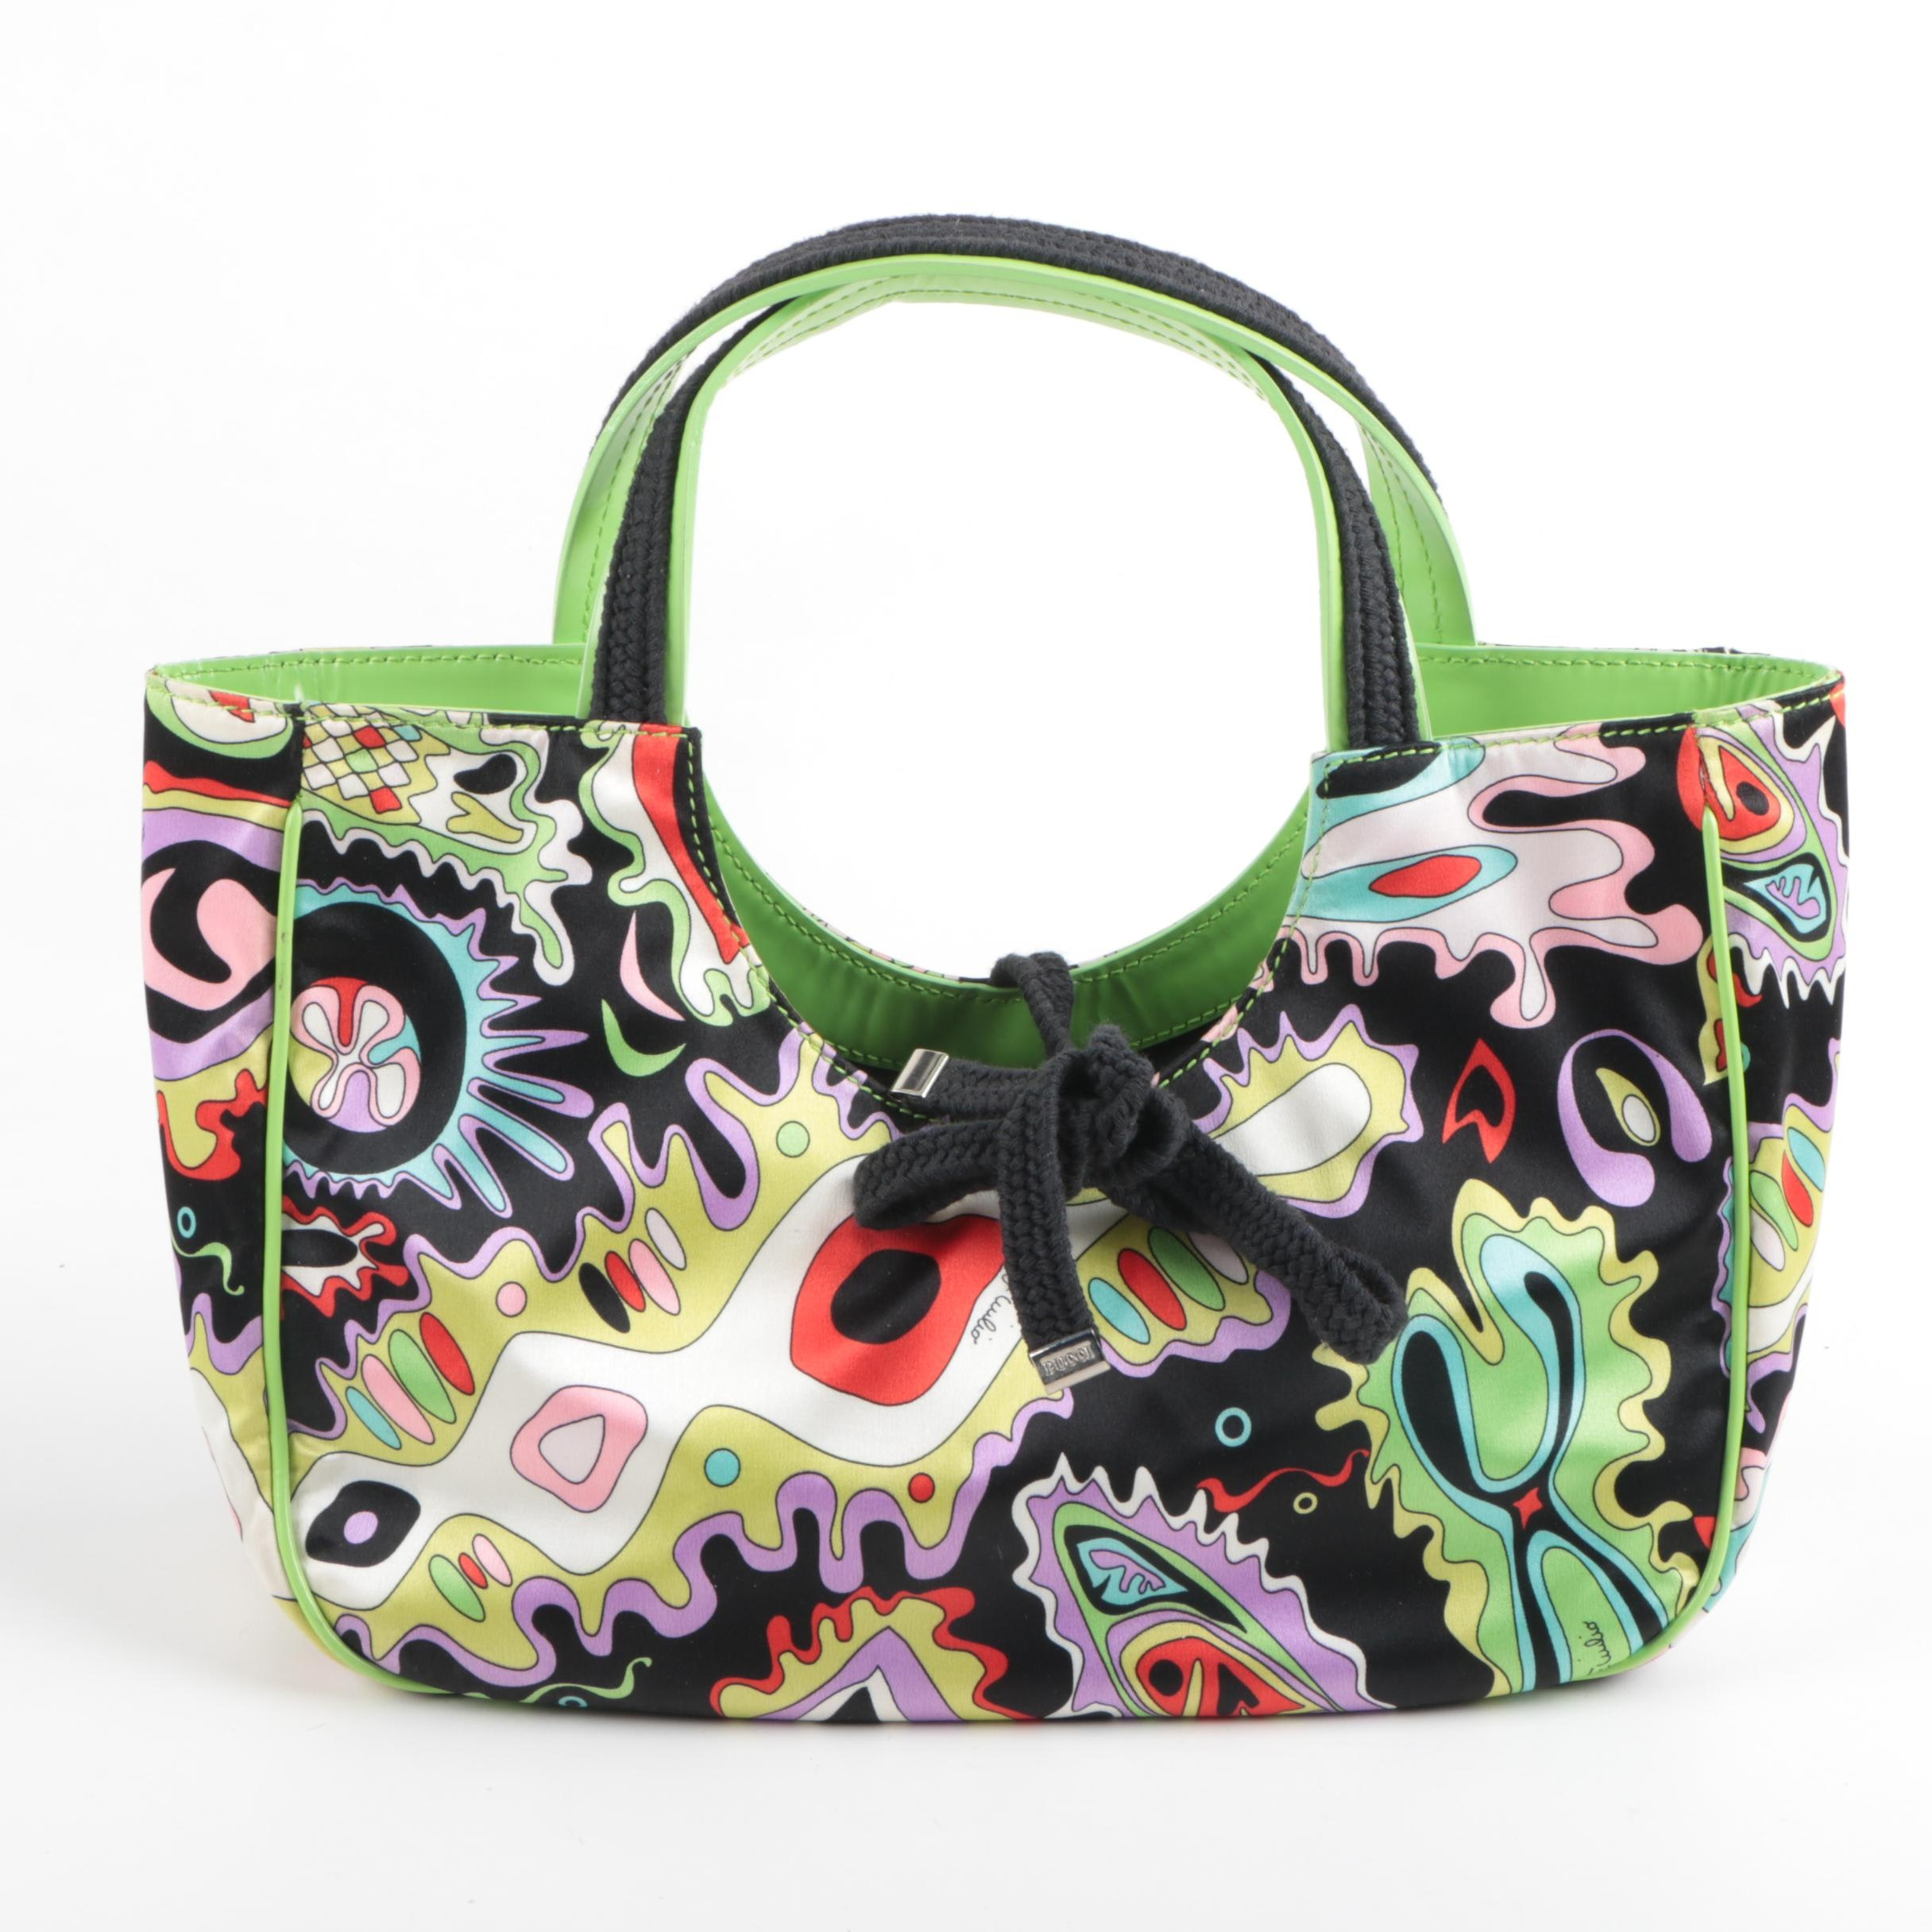 Emilio Pucci Patterned Nylon Shopper Handbag